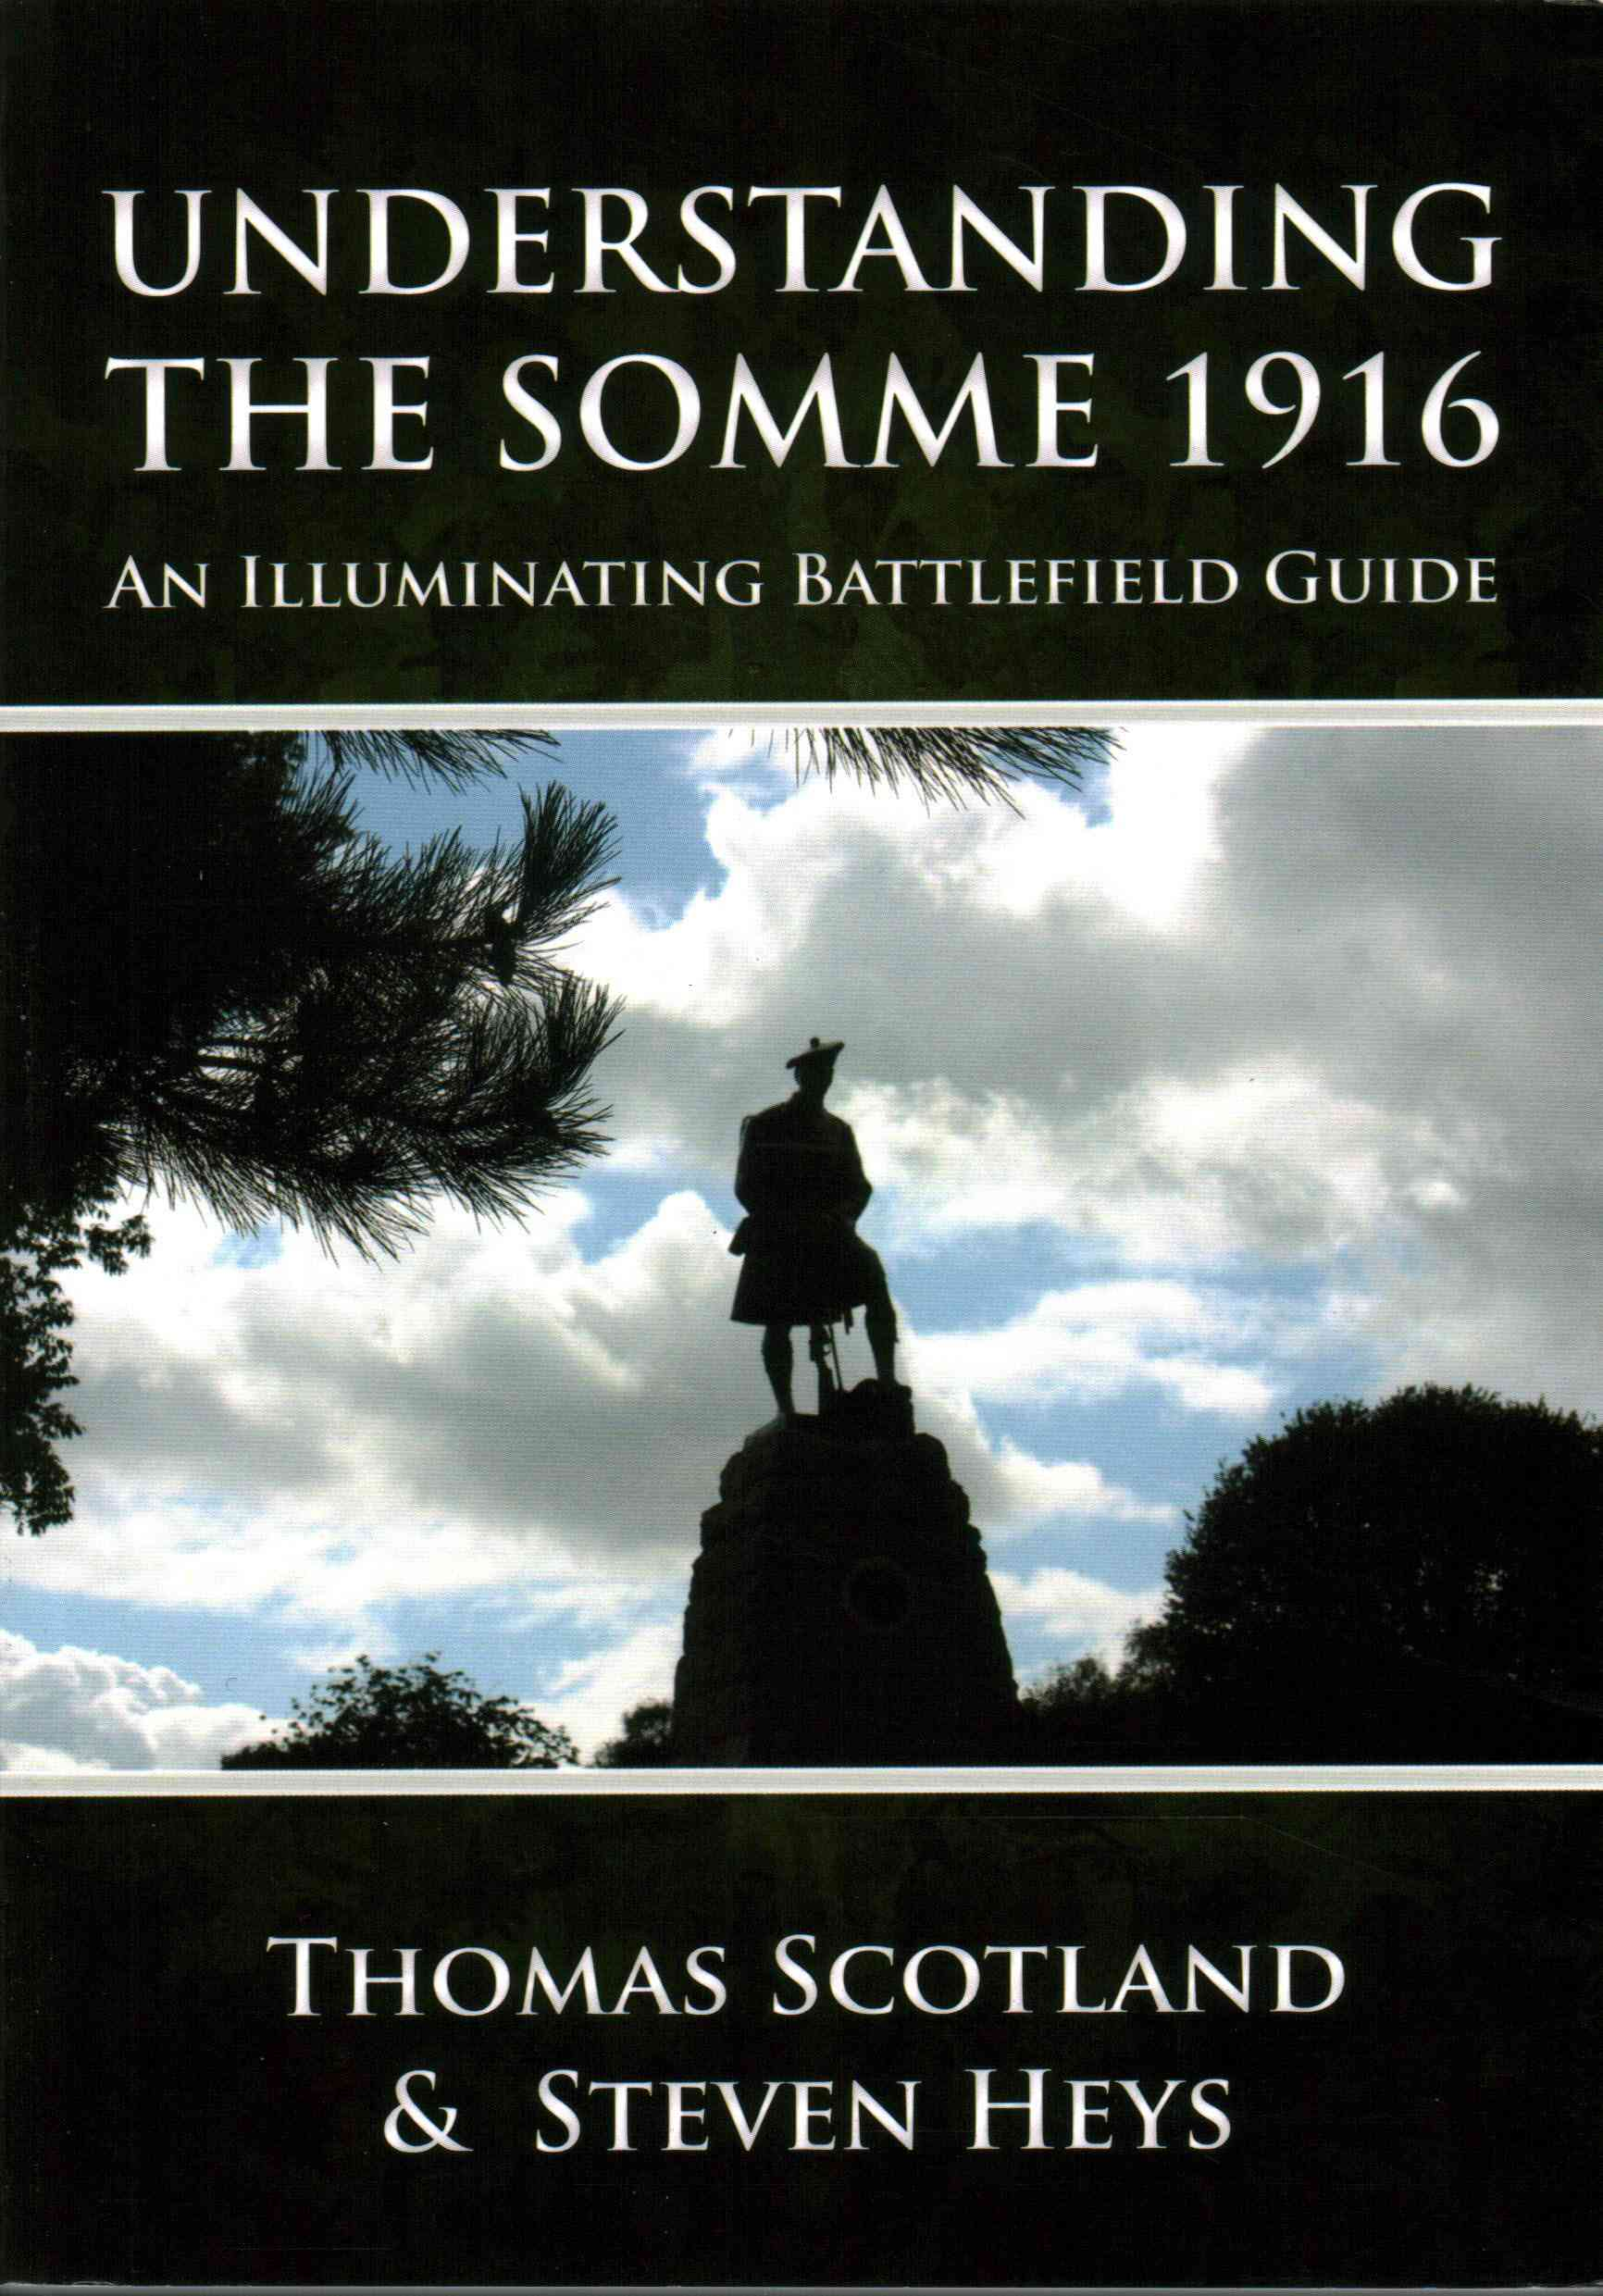 Understanding the Somme 1916: An Illuminating Battlefield Guide (Paperback)